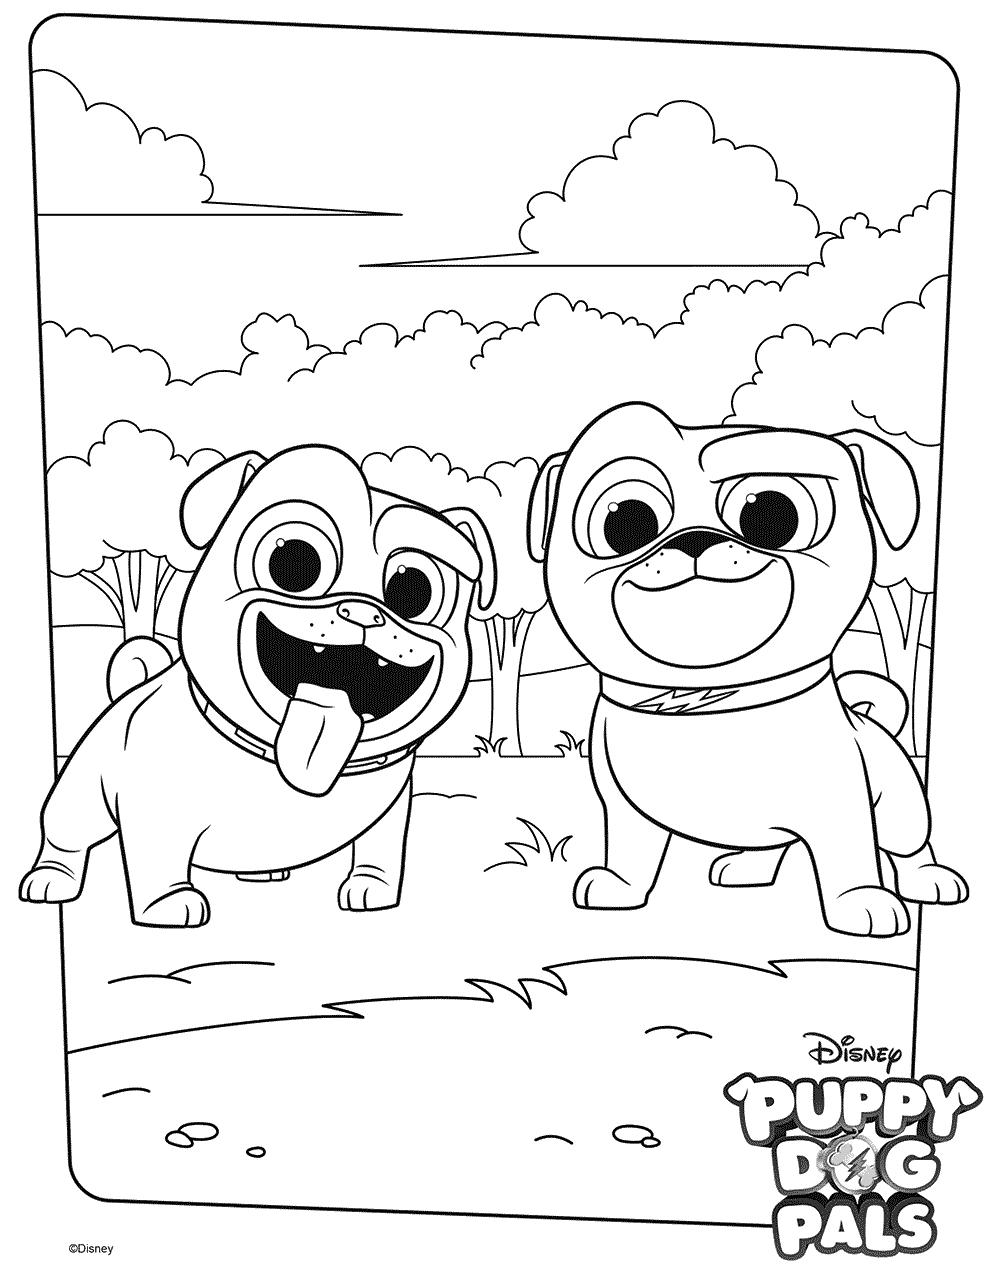 Coloriage Bingo et Rolly Puppy Dog Pals